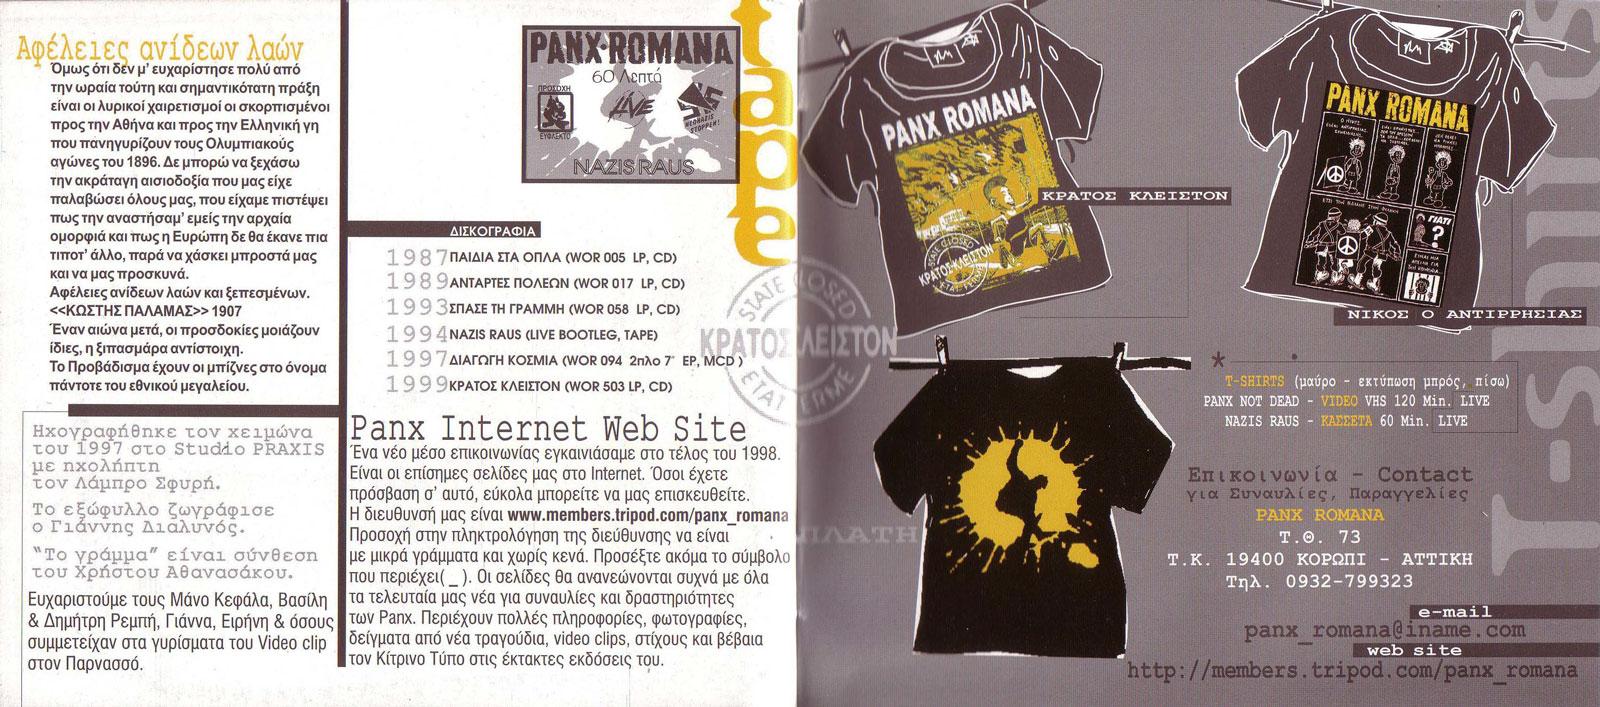 Panx Romana - Κράτος Κλειστόν